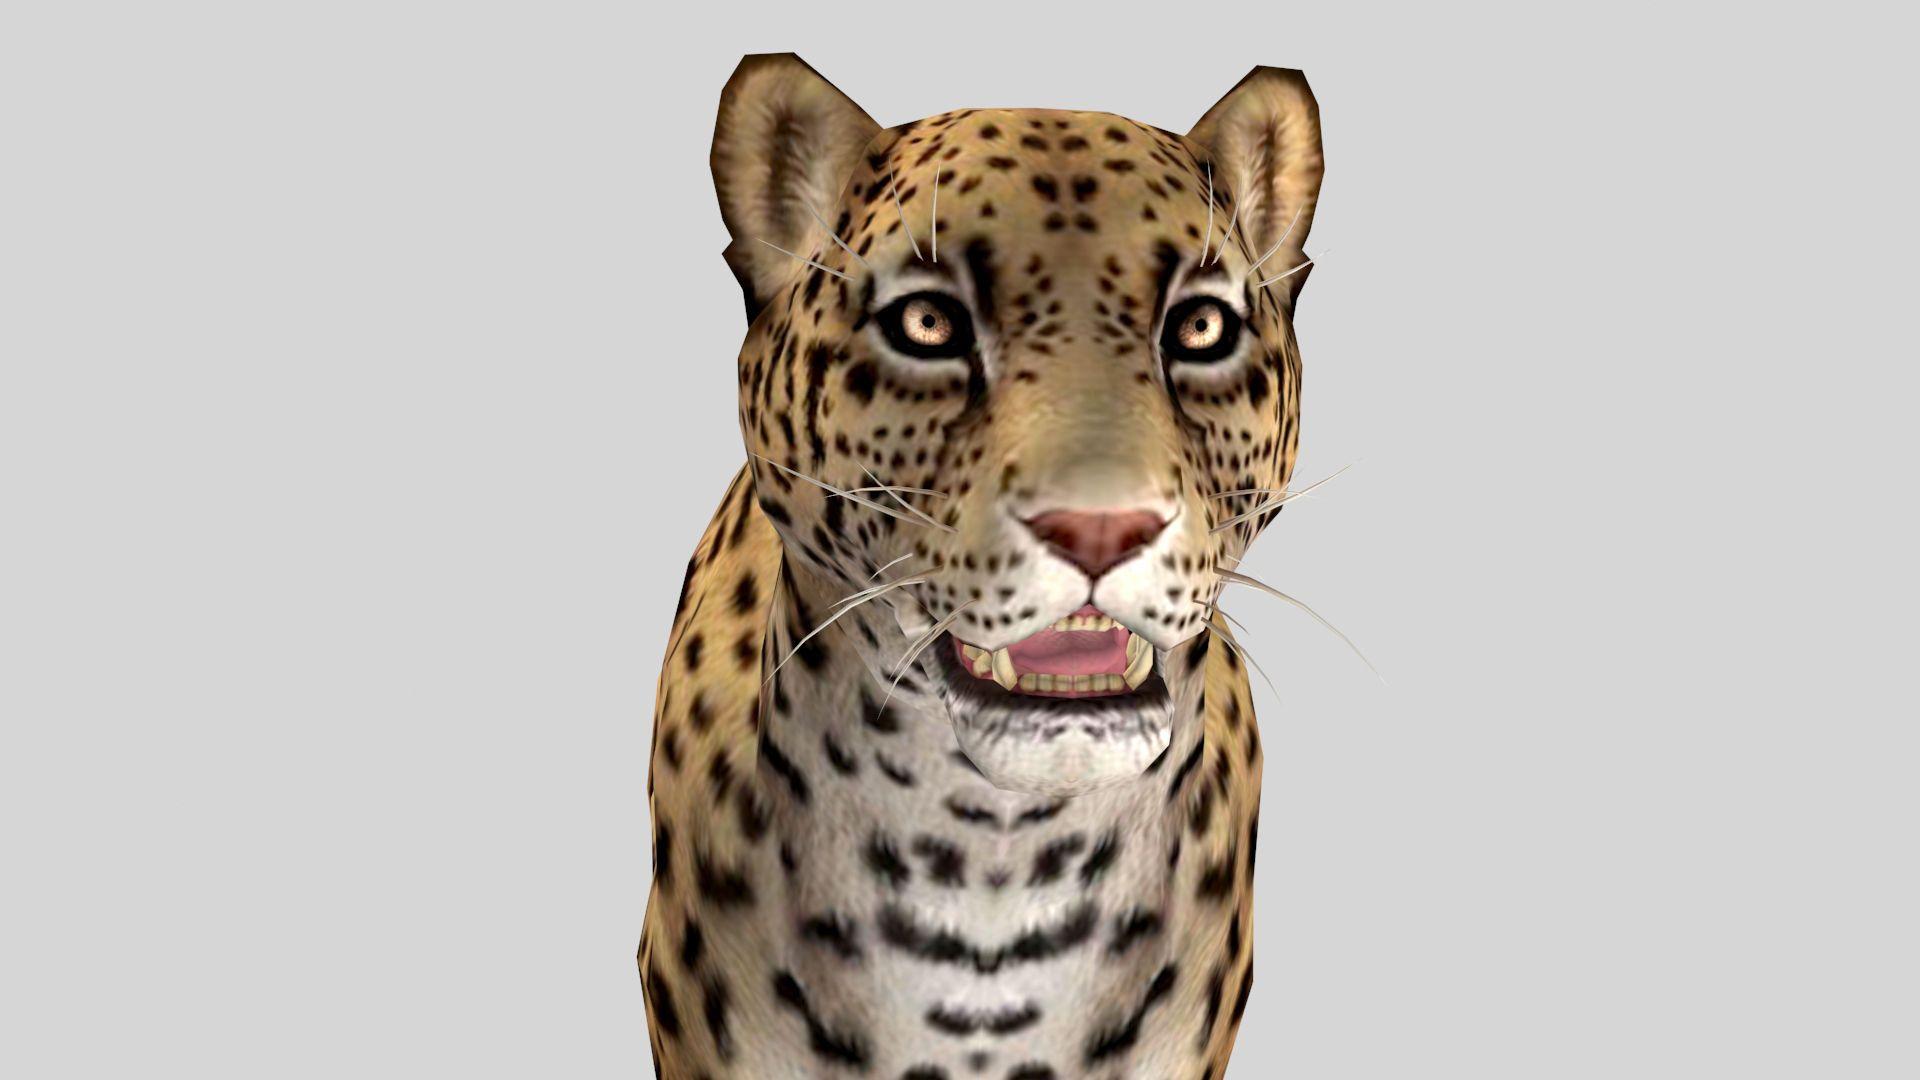 Jaguar 3D | 3D Models in 2019 | Jaguar, Animals, Low poly games